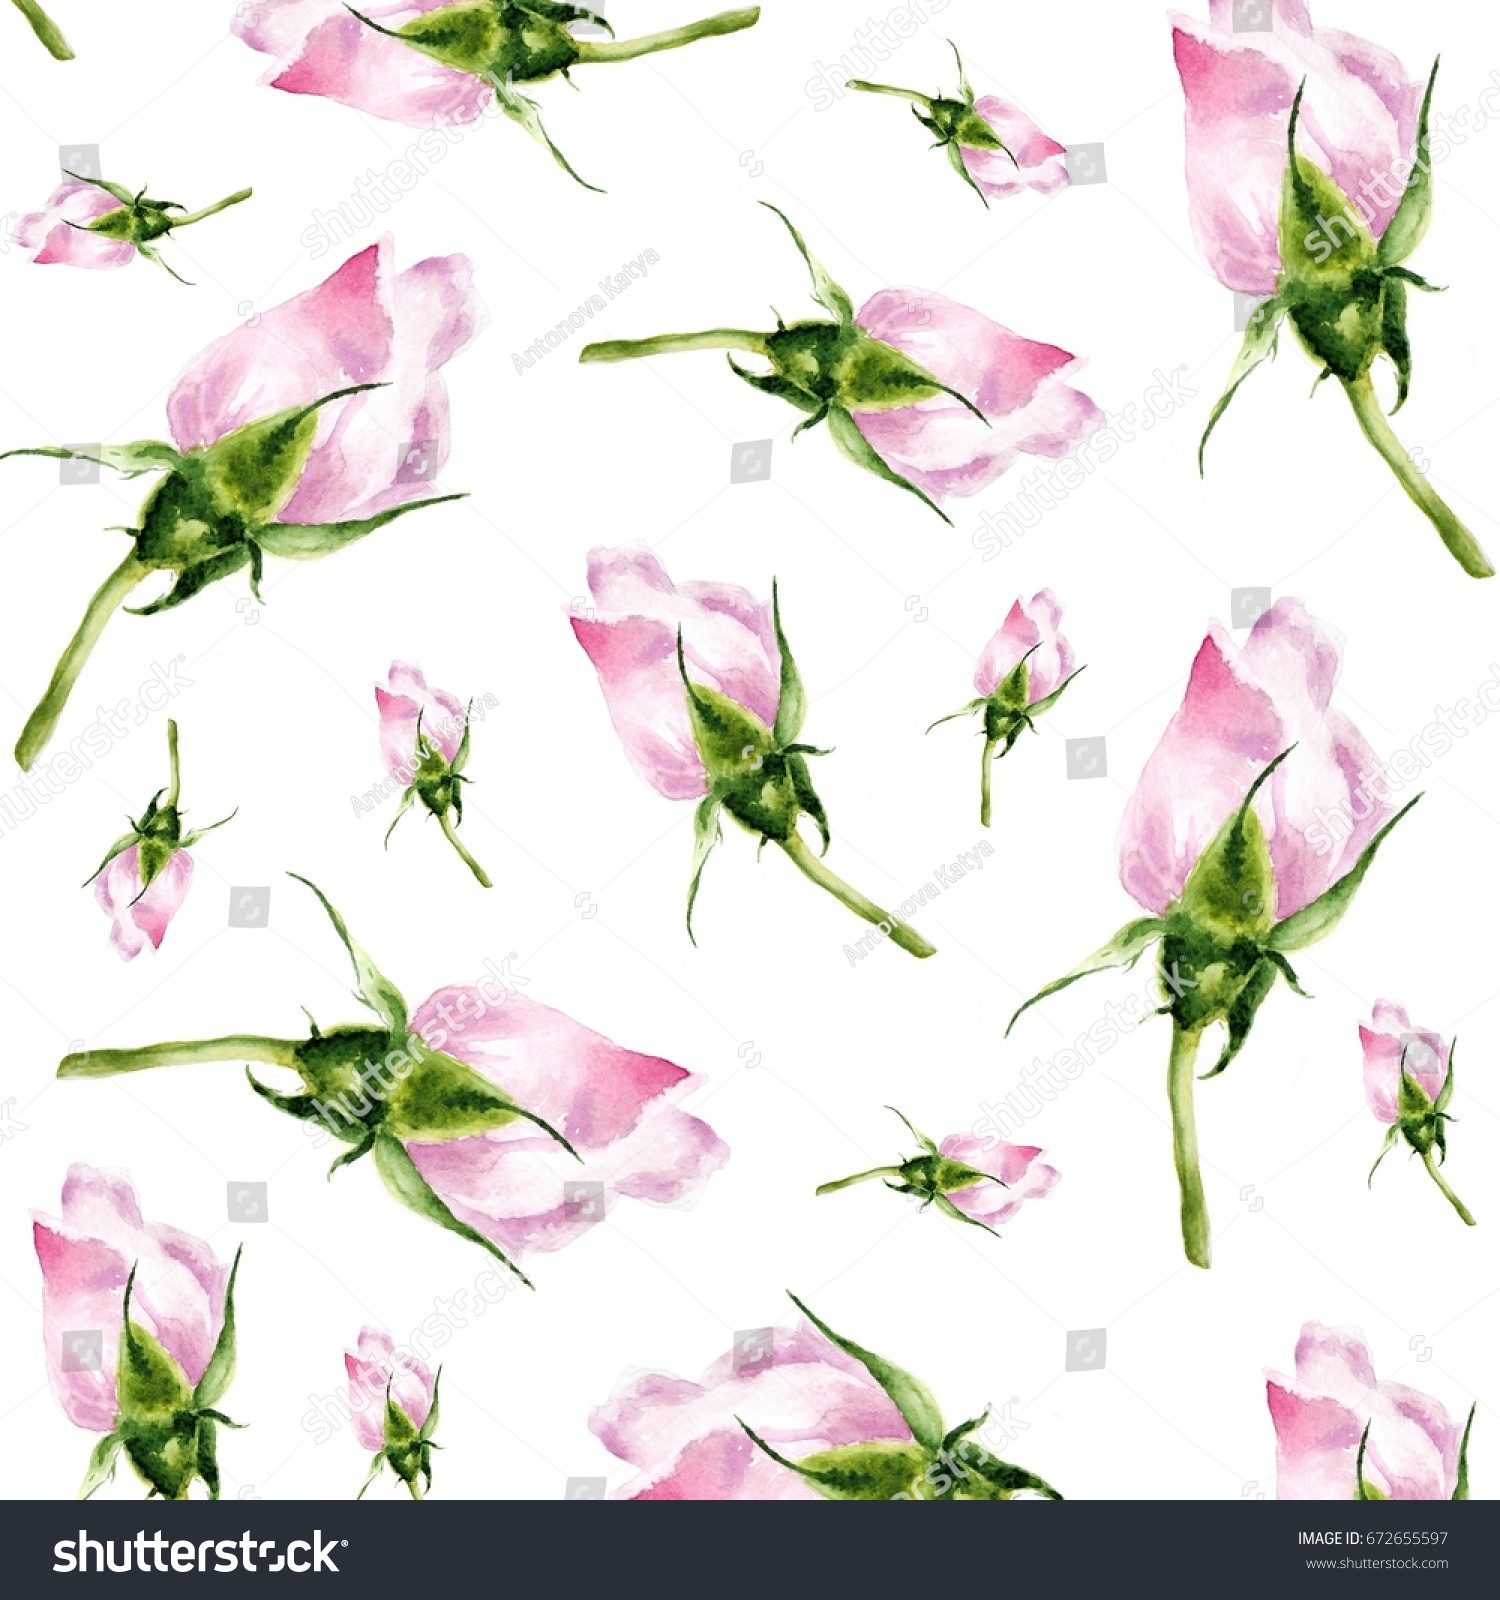 Pink Rose Bud Watercolor Illustration Pattern Stock Illustration